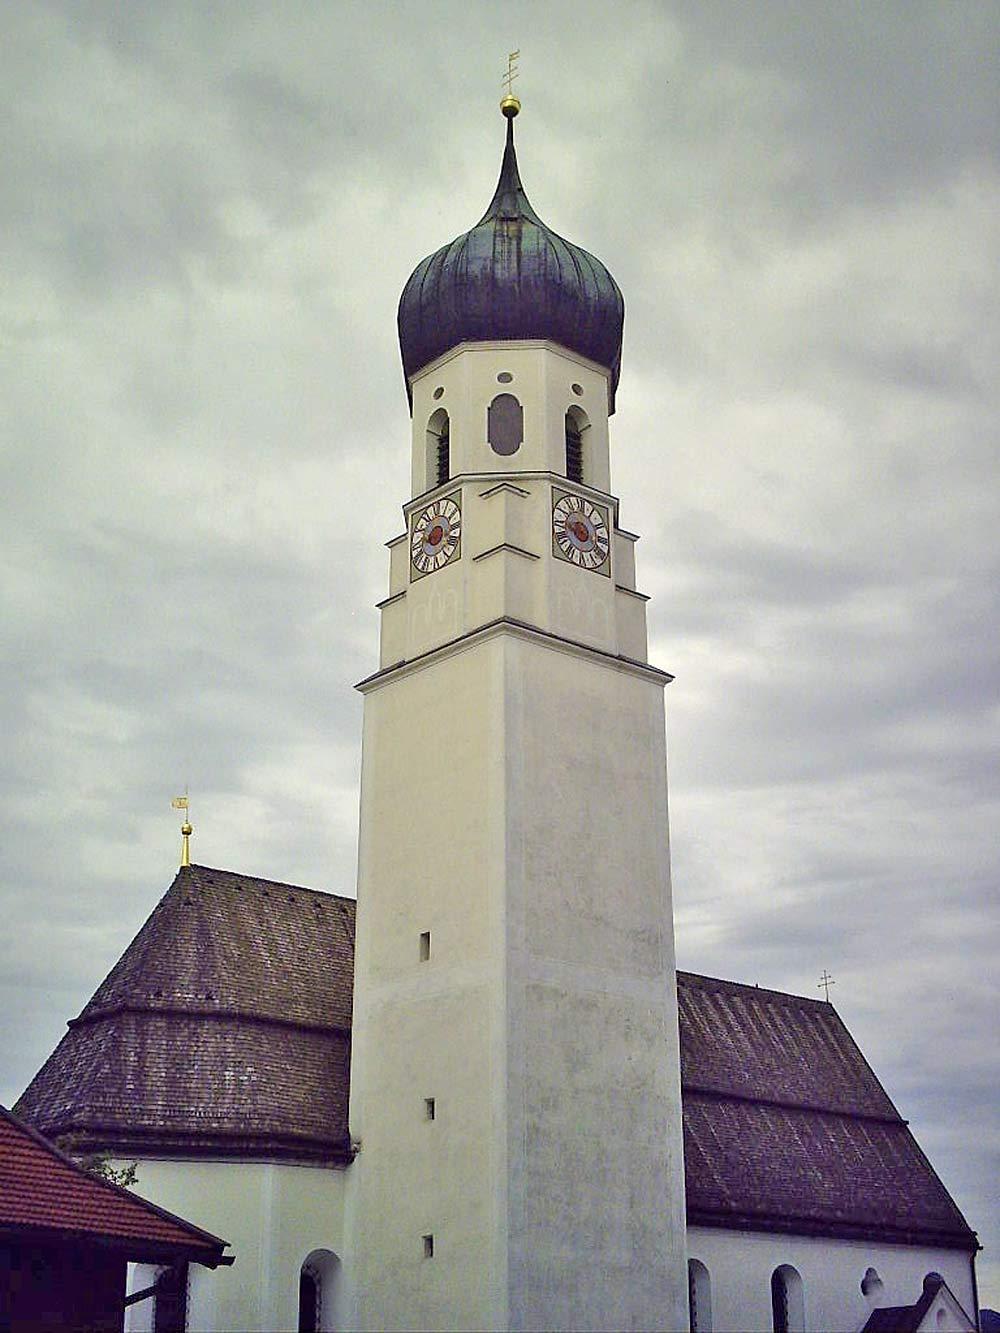 Turm der St. Michael-Kirche in Gaissach